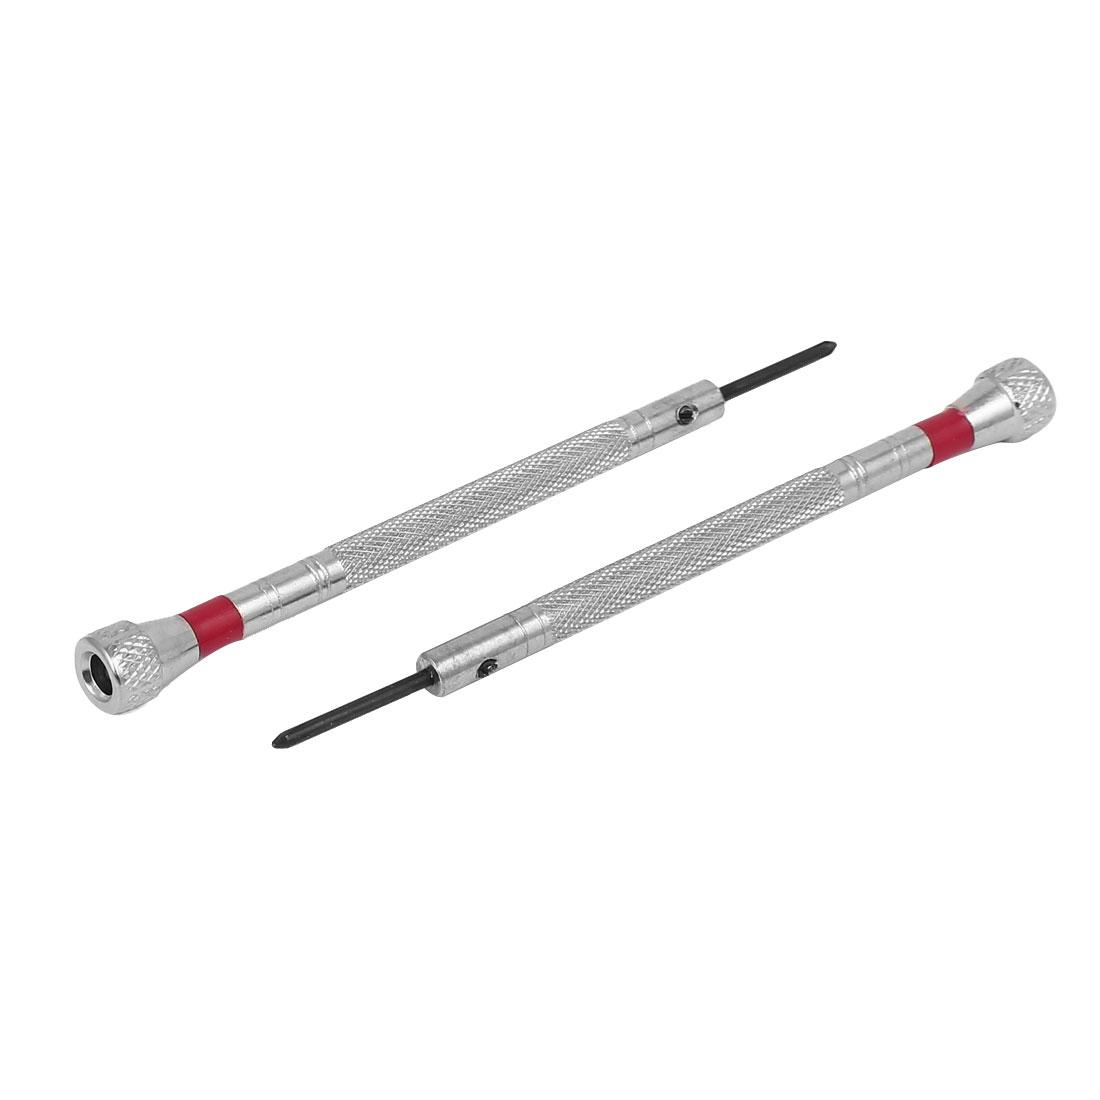 1.6mm Width Tip Knurled Handle Phillips Screwdriver Watch Repair Tool 2pcs